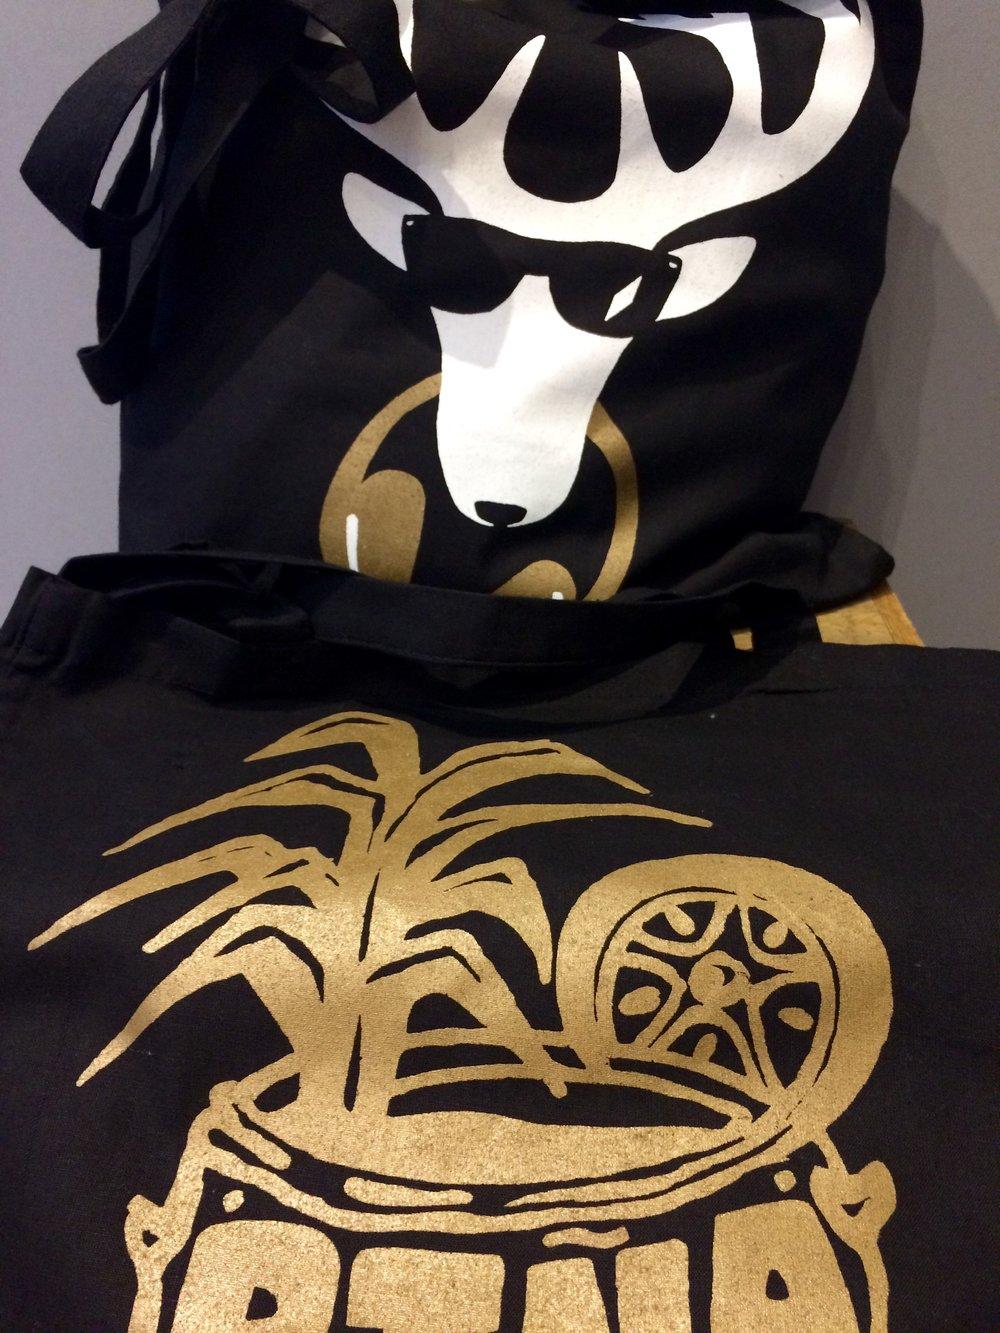 DJ Stag / Pina Colada tote bags